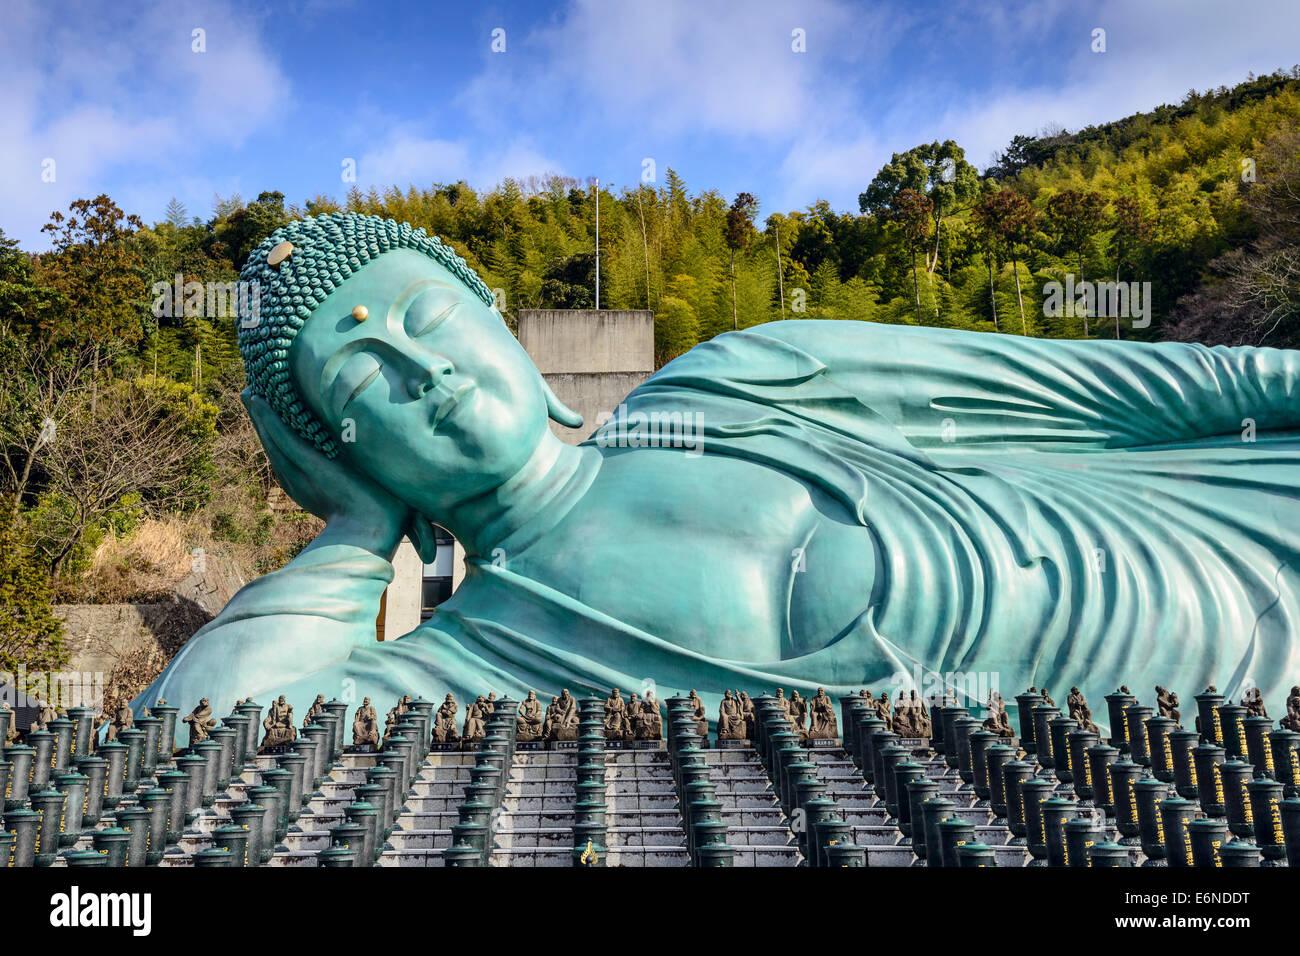 The Reclining Buddha of Nanzoin Temple in Fukuoka, Japan. - Stock Image